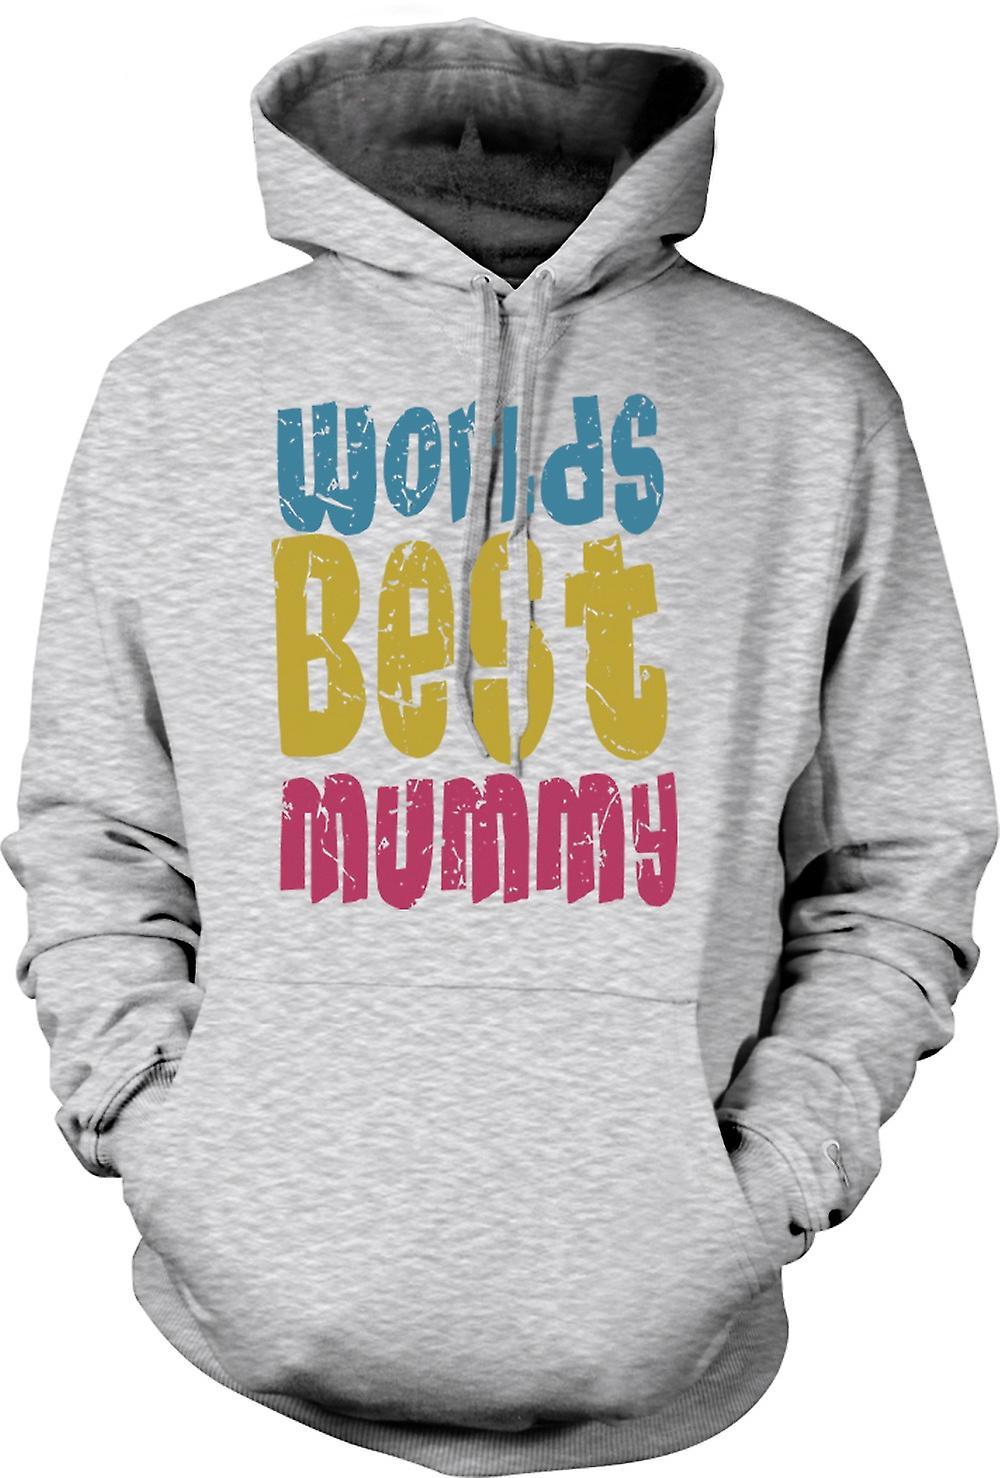 Mens Hoodie - Worlds Best Mummy - Funny